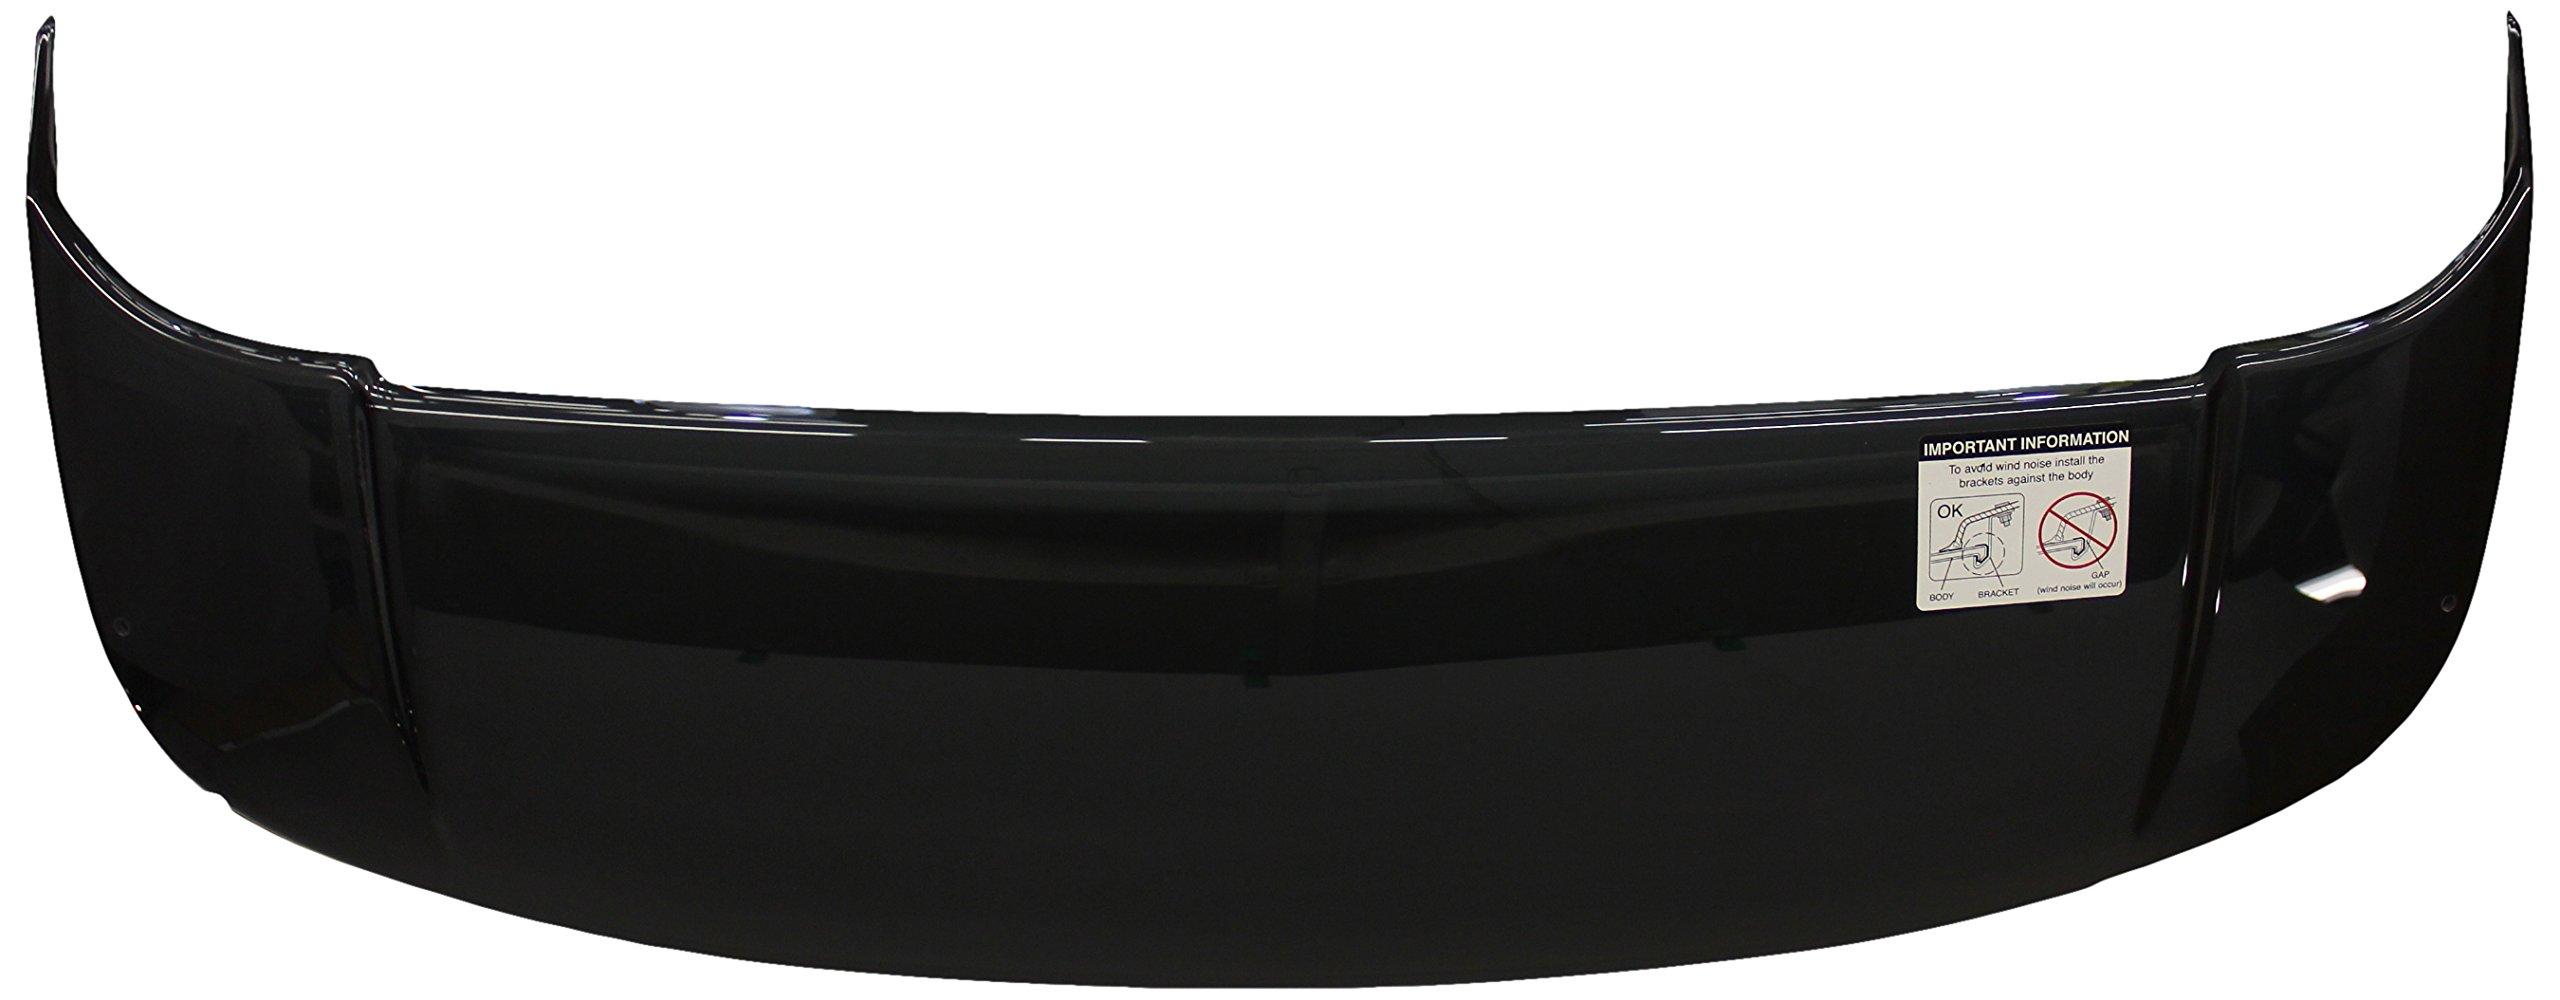 Honda Genuine Accessories 08R01-SWA-101 Sunroof Visor